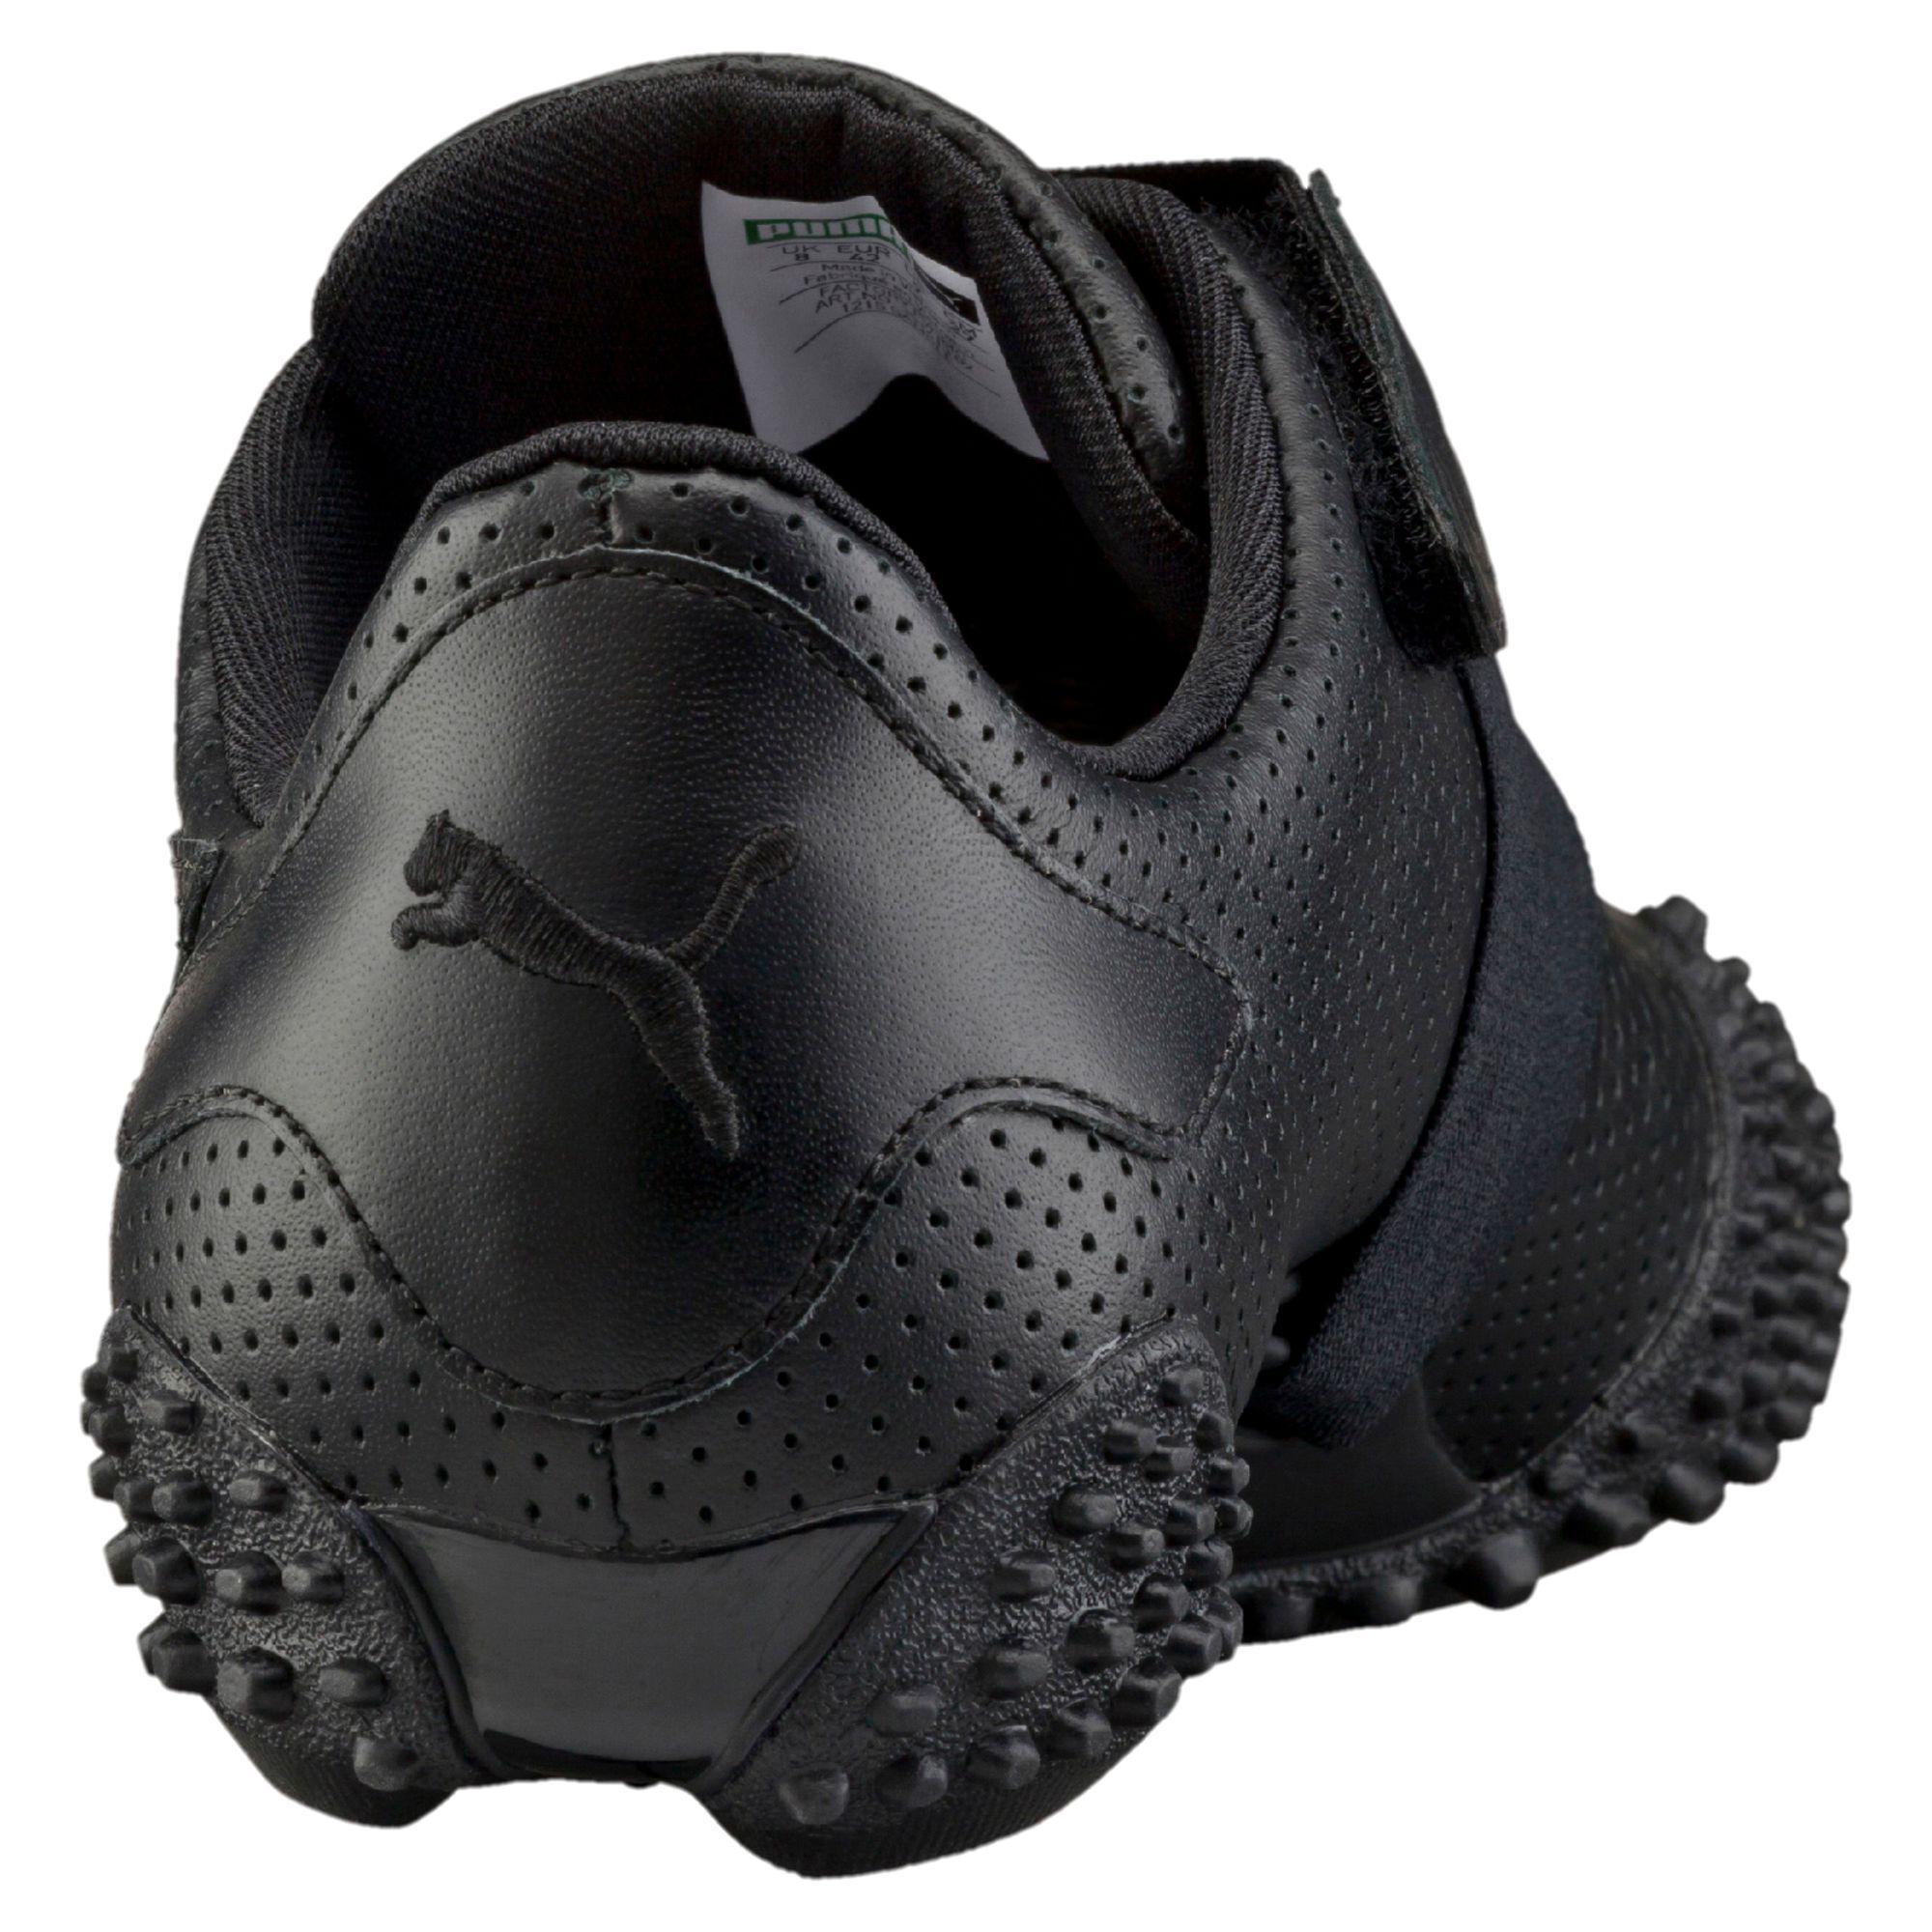 7c8651152ecf Lyst - PUMA Mostro Perf Leather in Black for Men